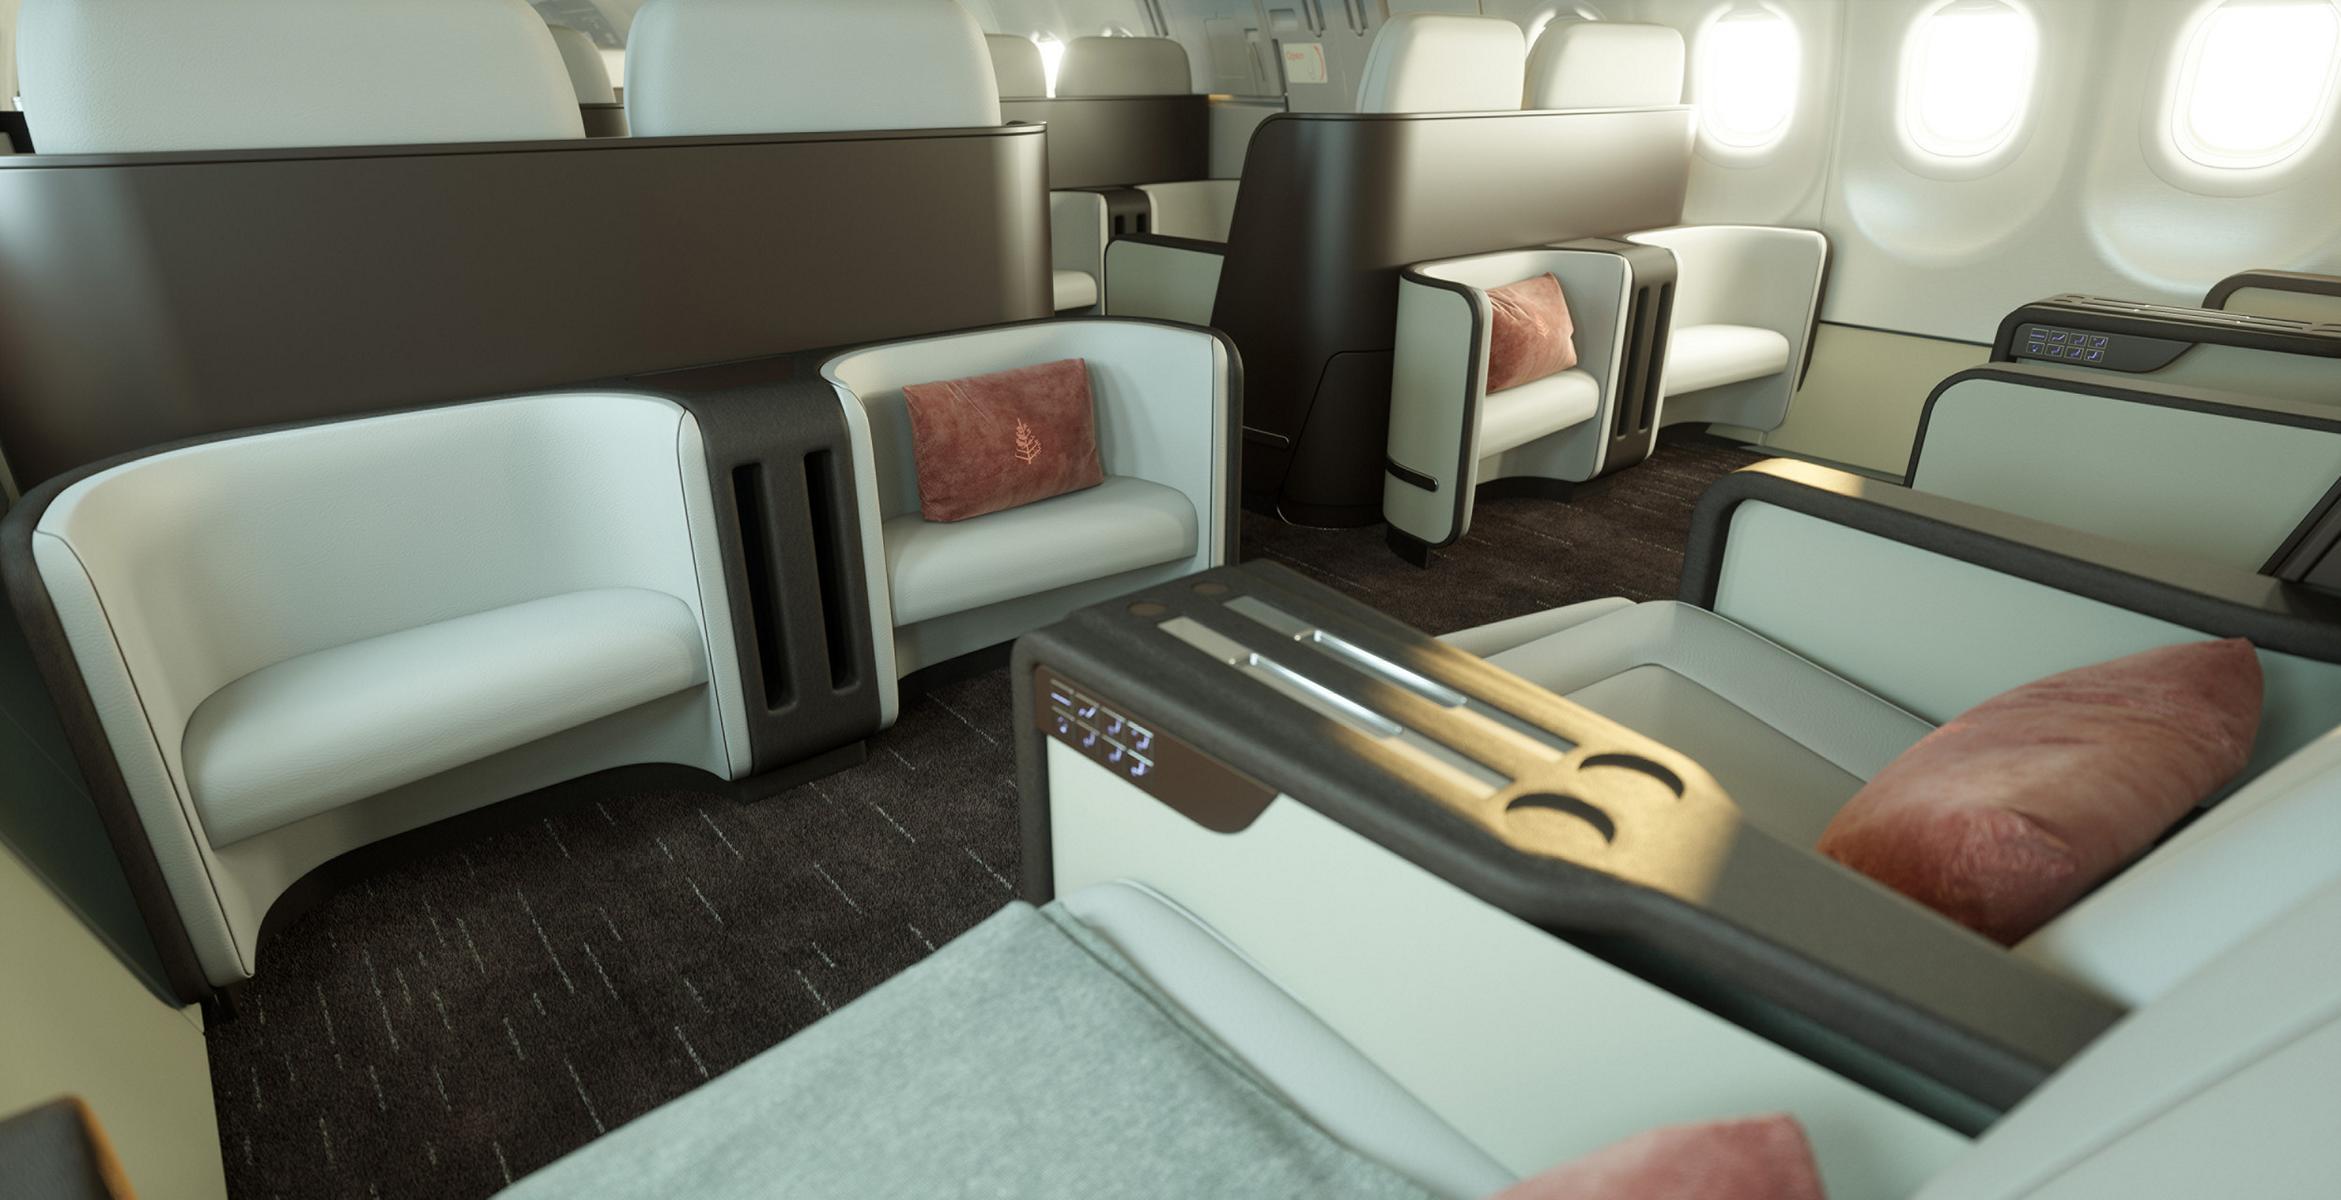 Die geräumigen Sitze des Four Seasons Private Jet